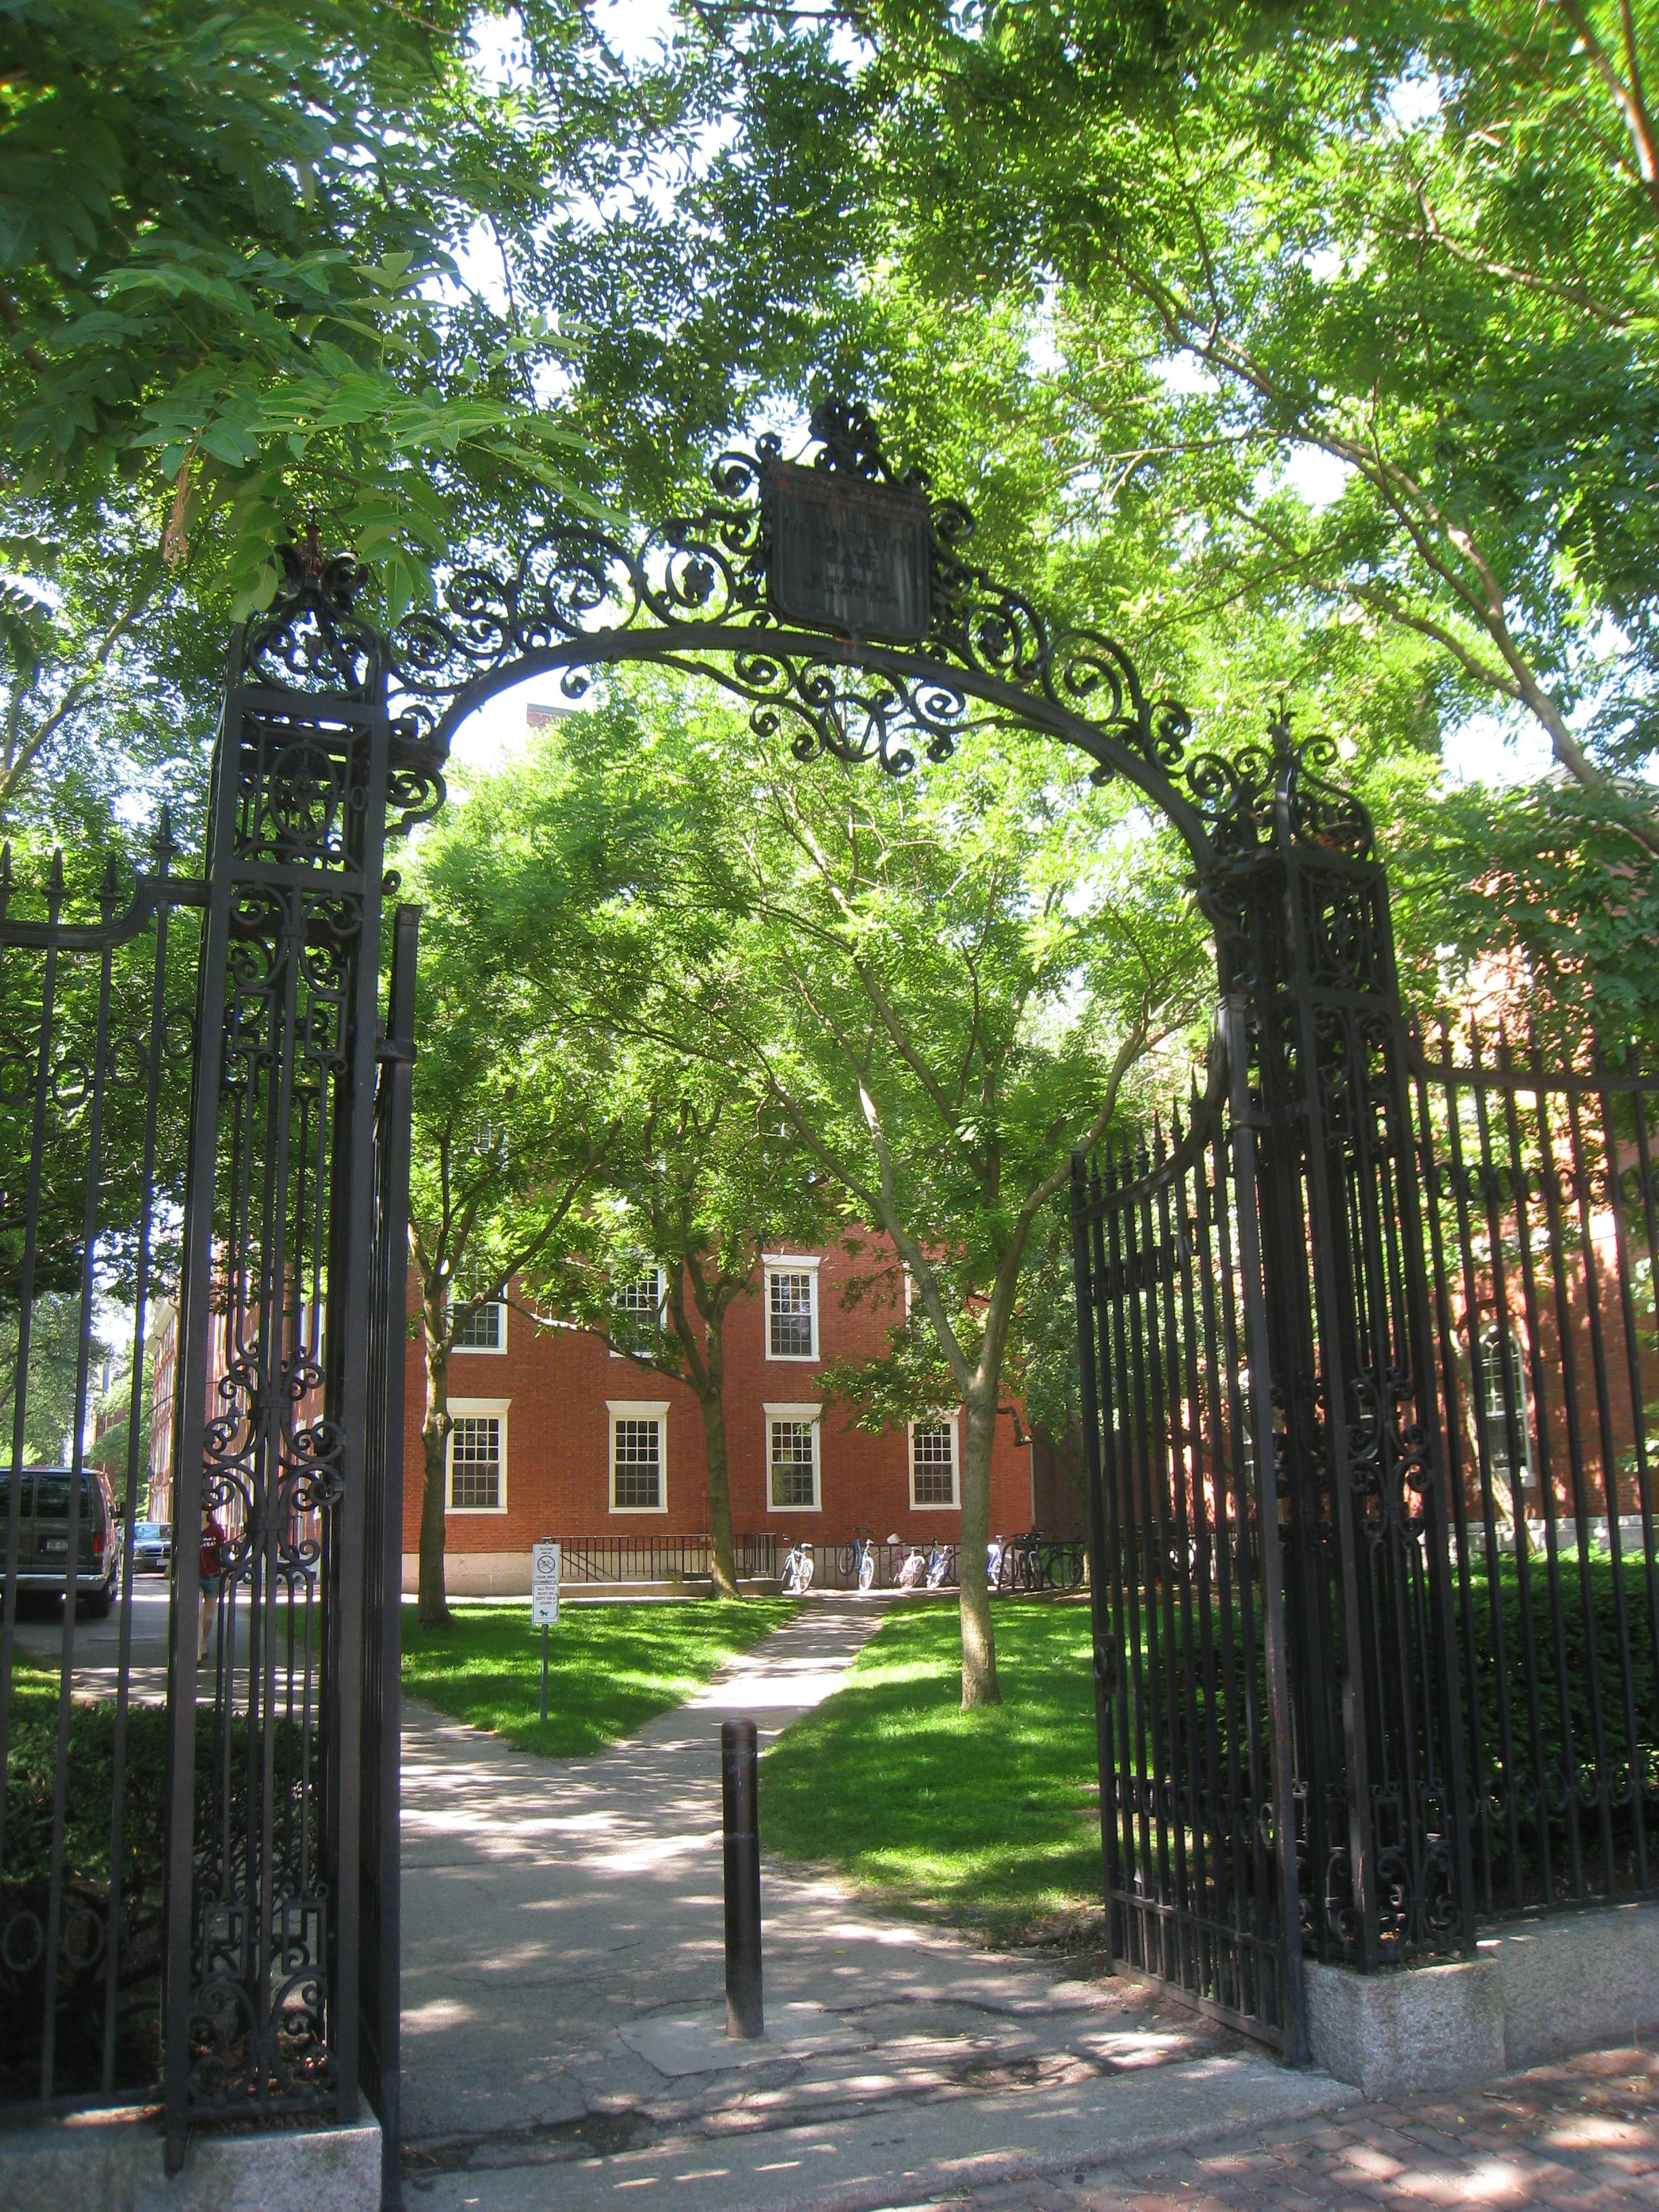 Park The Car In Harvard Yard